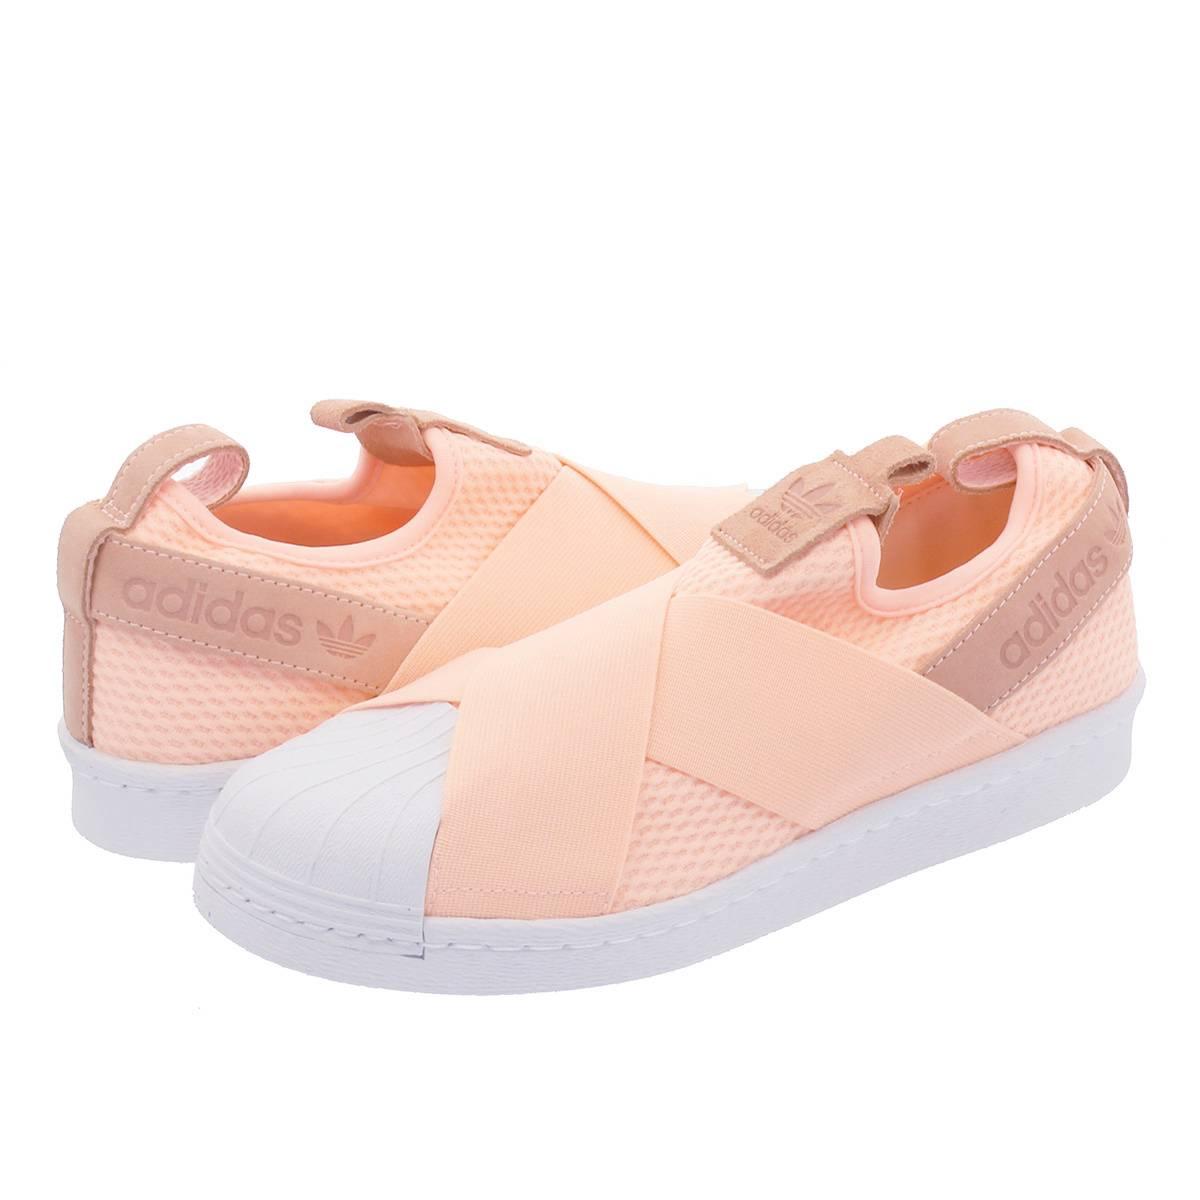 size 40 2ae9d 53329 adidas SS Slip On W Adidas superstar slip-ons women CLEAR ORANGE/RUNNING  WHITE